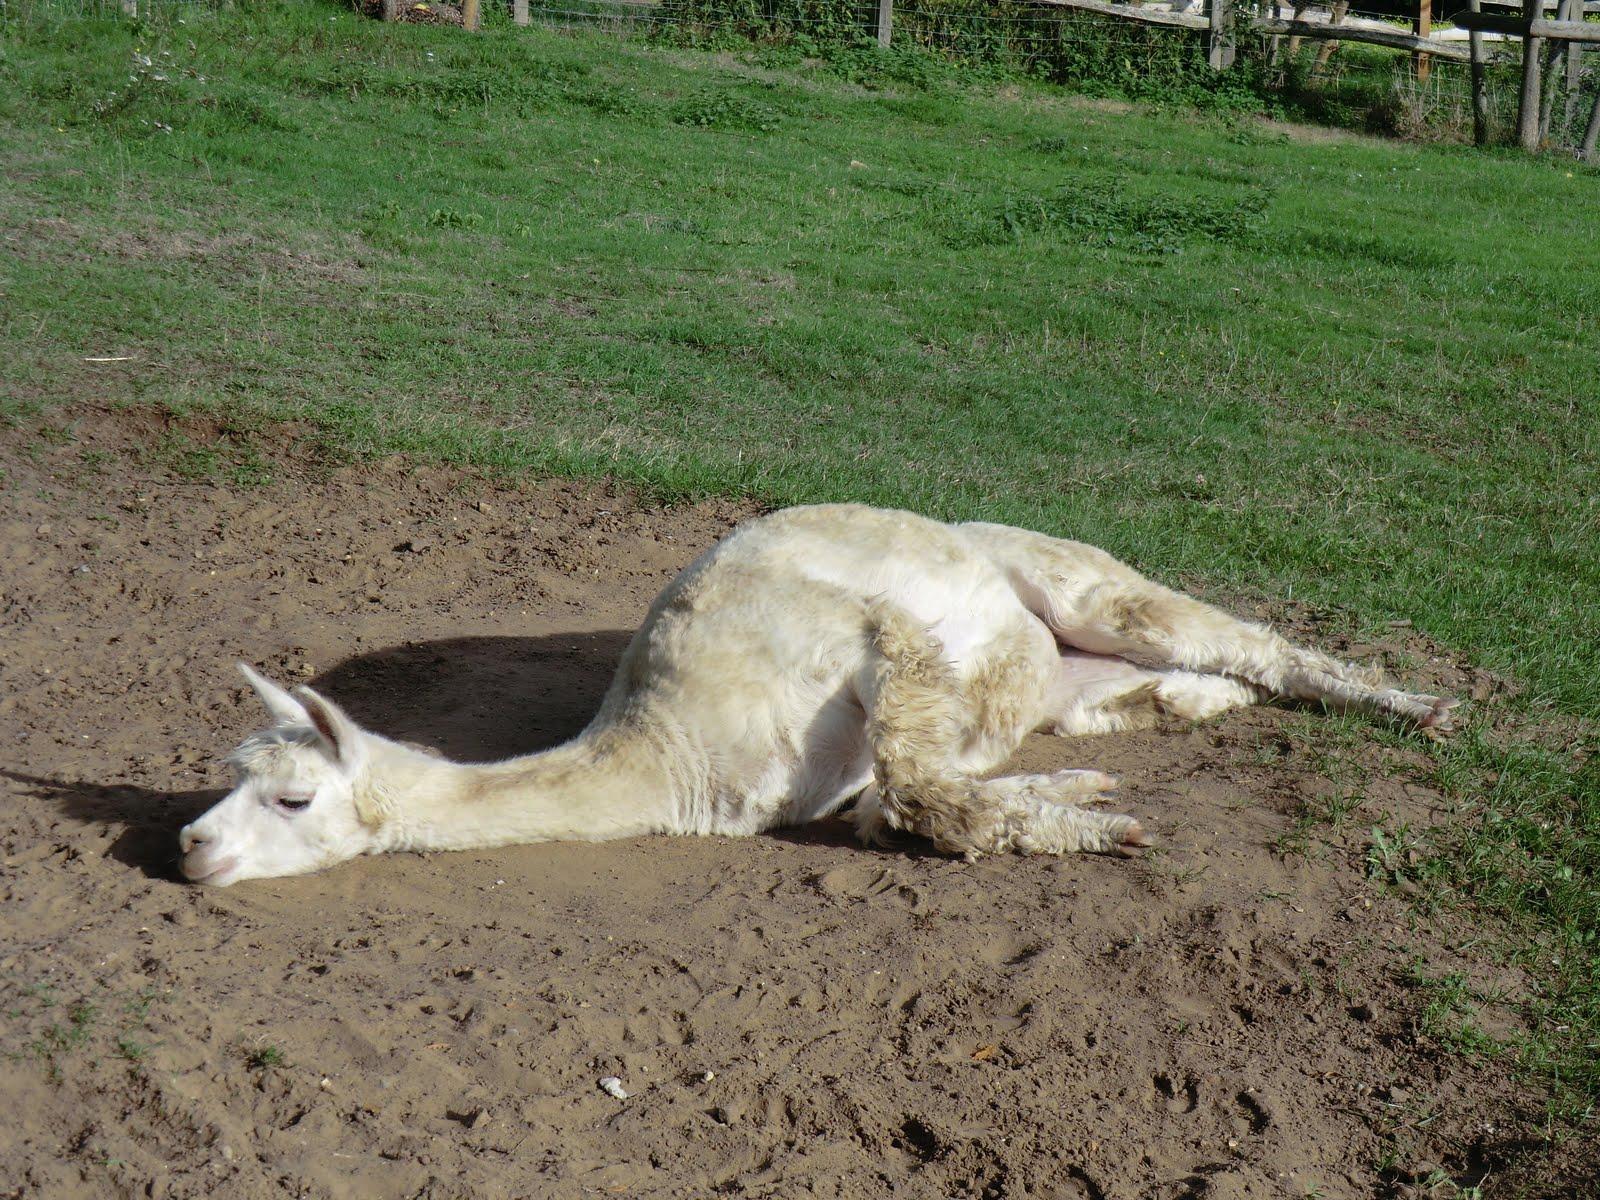 CIMG8770 Dozy alpaca at Chilworth Manor